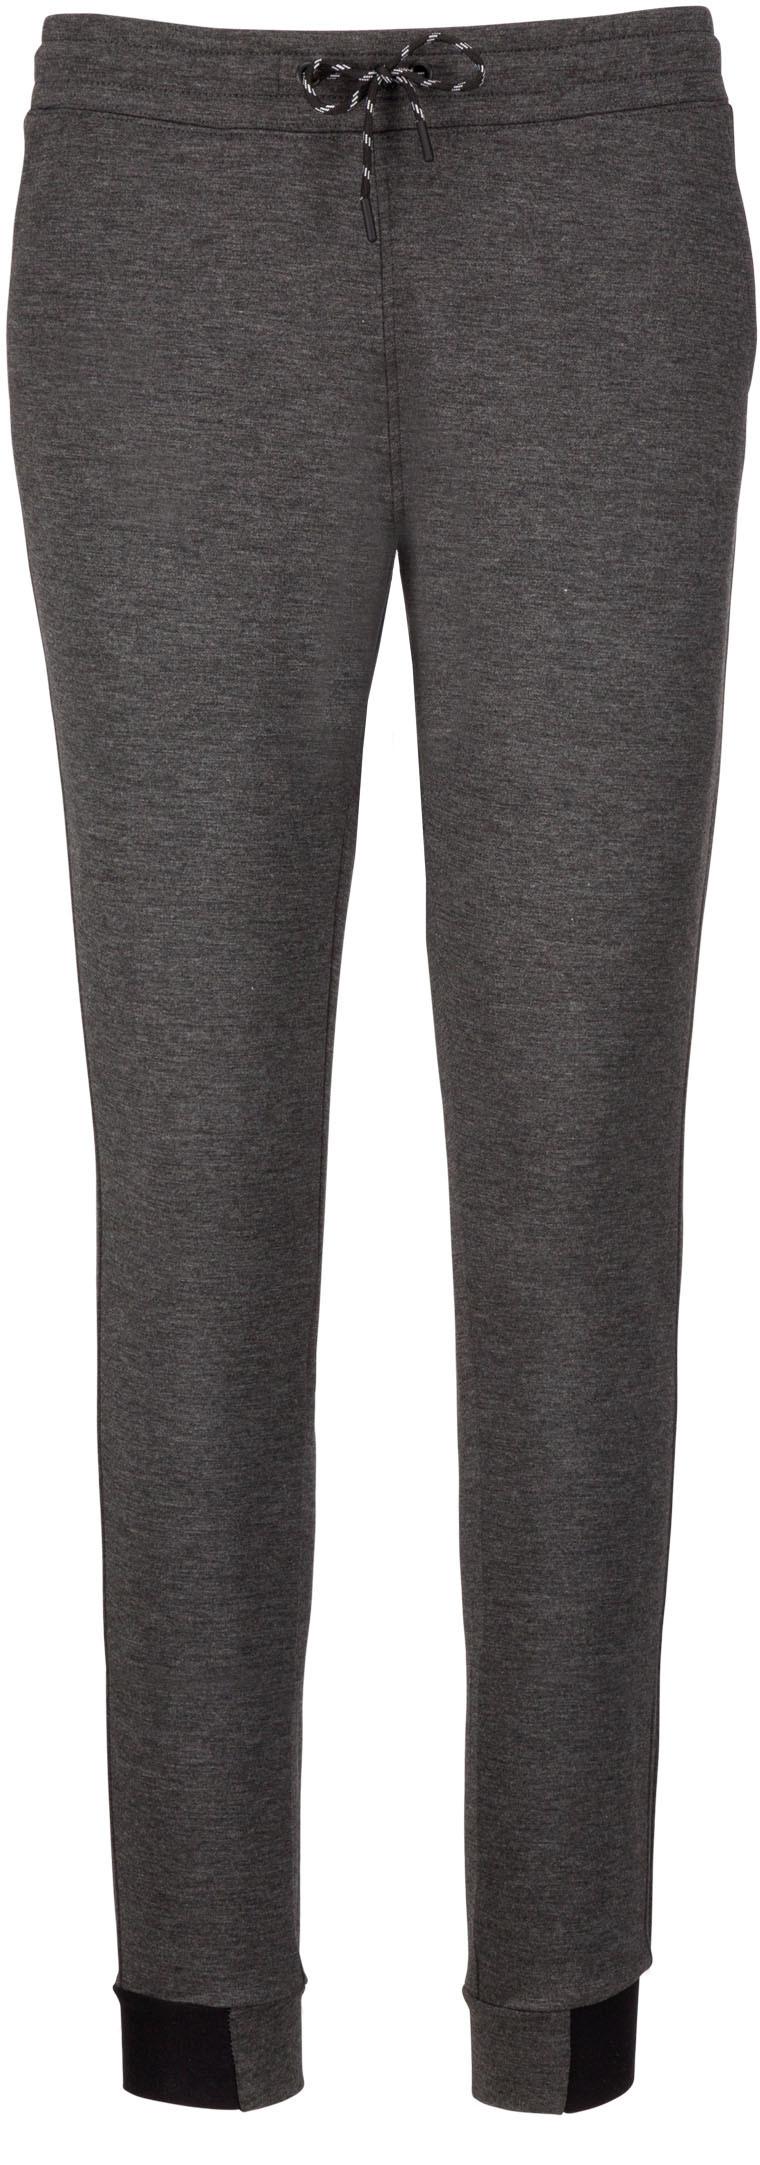 Pantalon femme - 2-1653-3